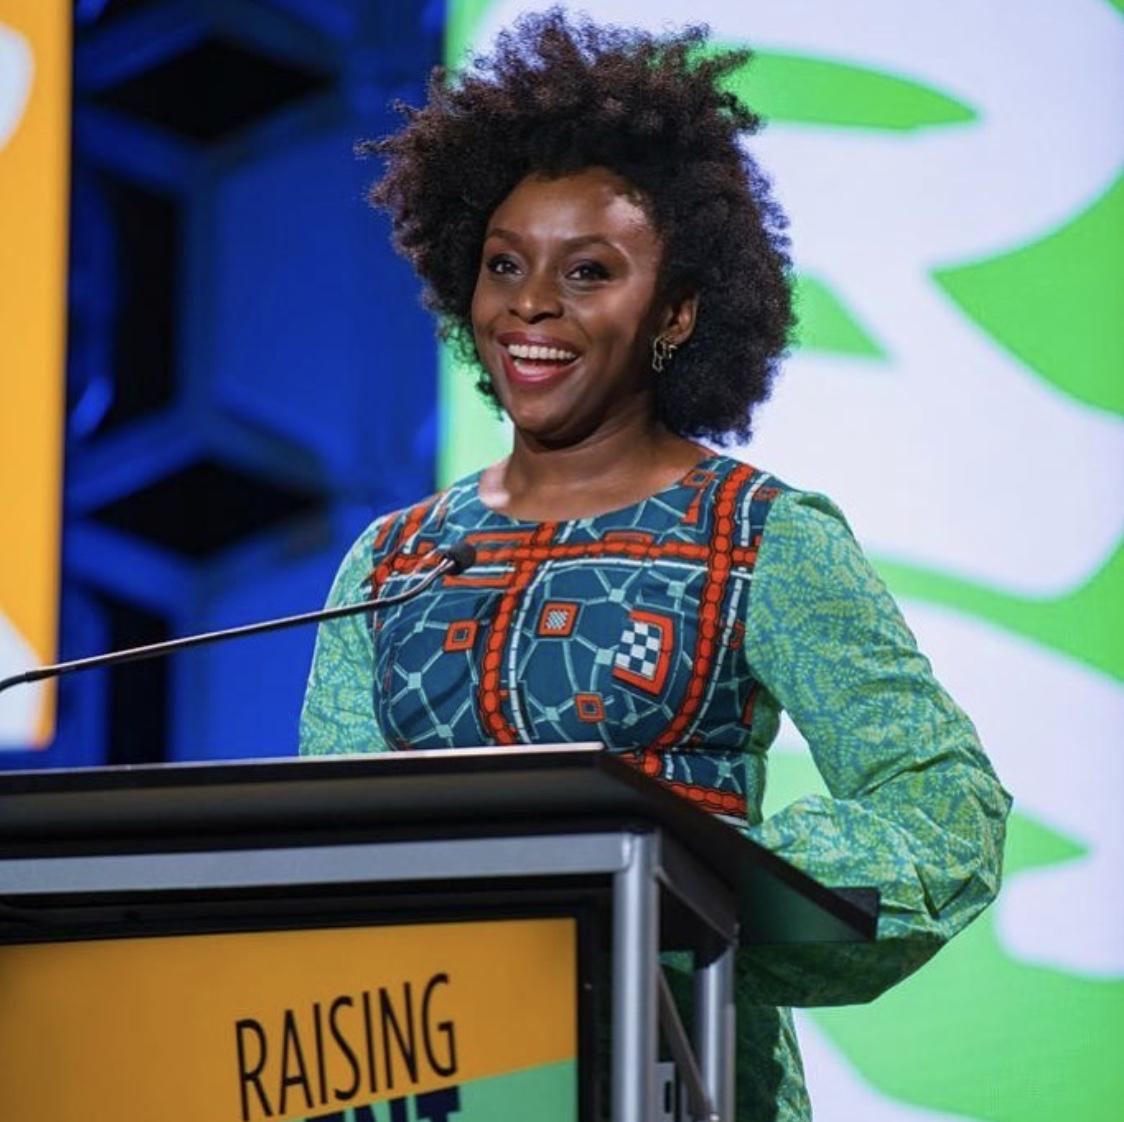 Feminism is not same as wickedness, says Chimamanda Ngozi-Adichie